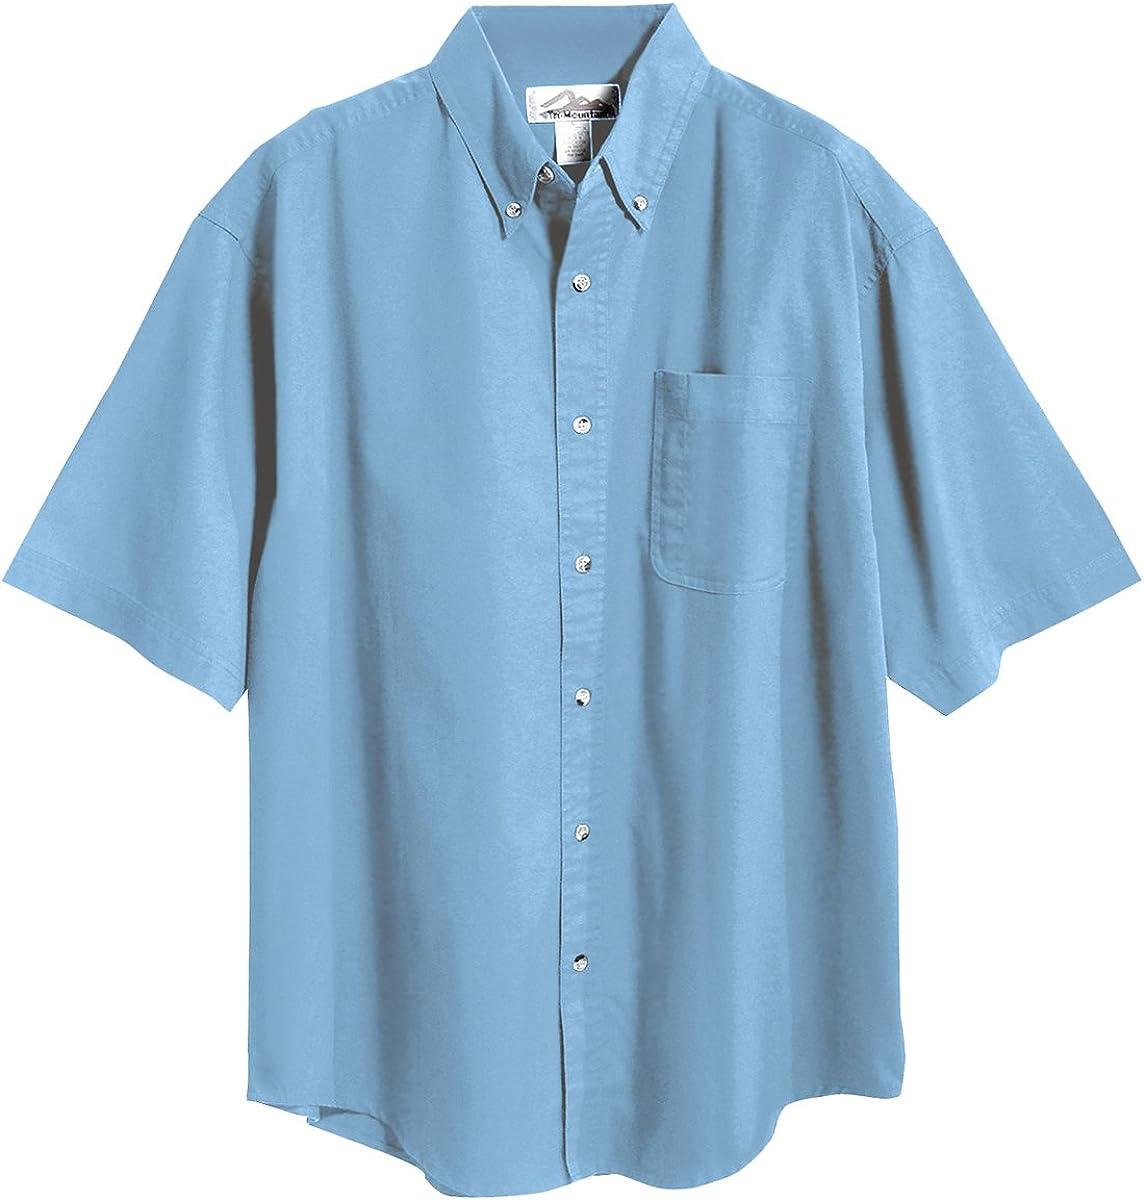 Tri-Mountain Men/'s Recruit Blend Twill Shirt with Teflon Stain Resistant Finish